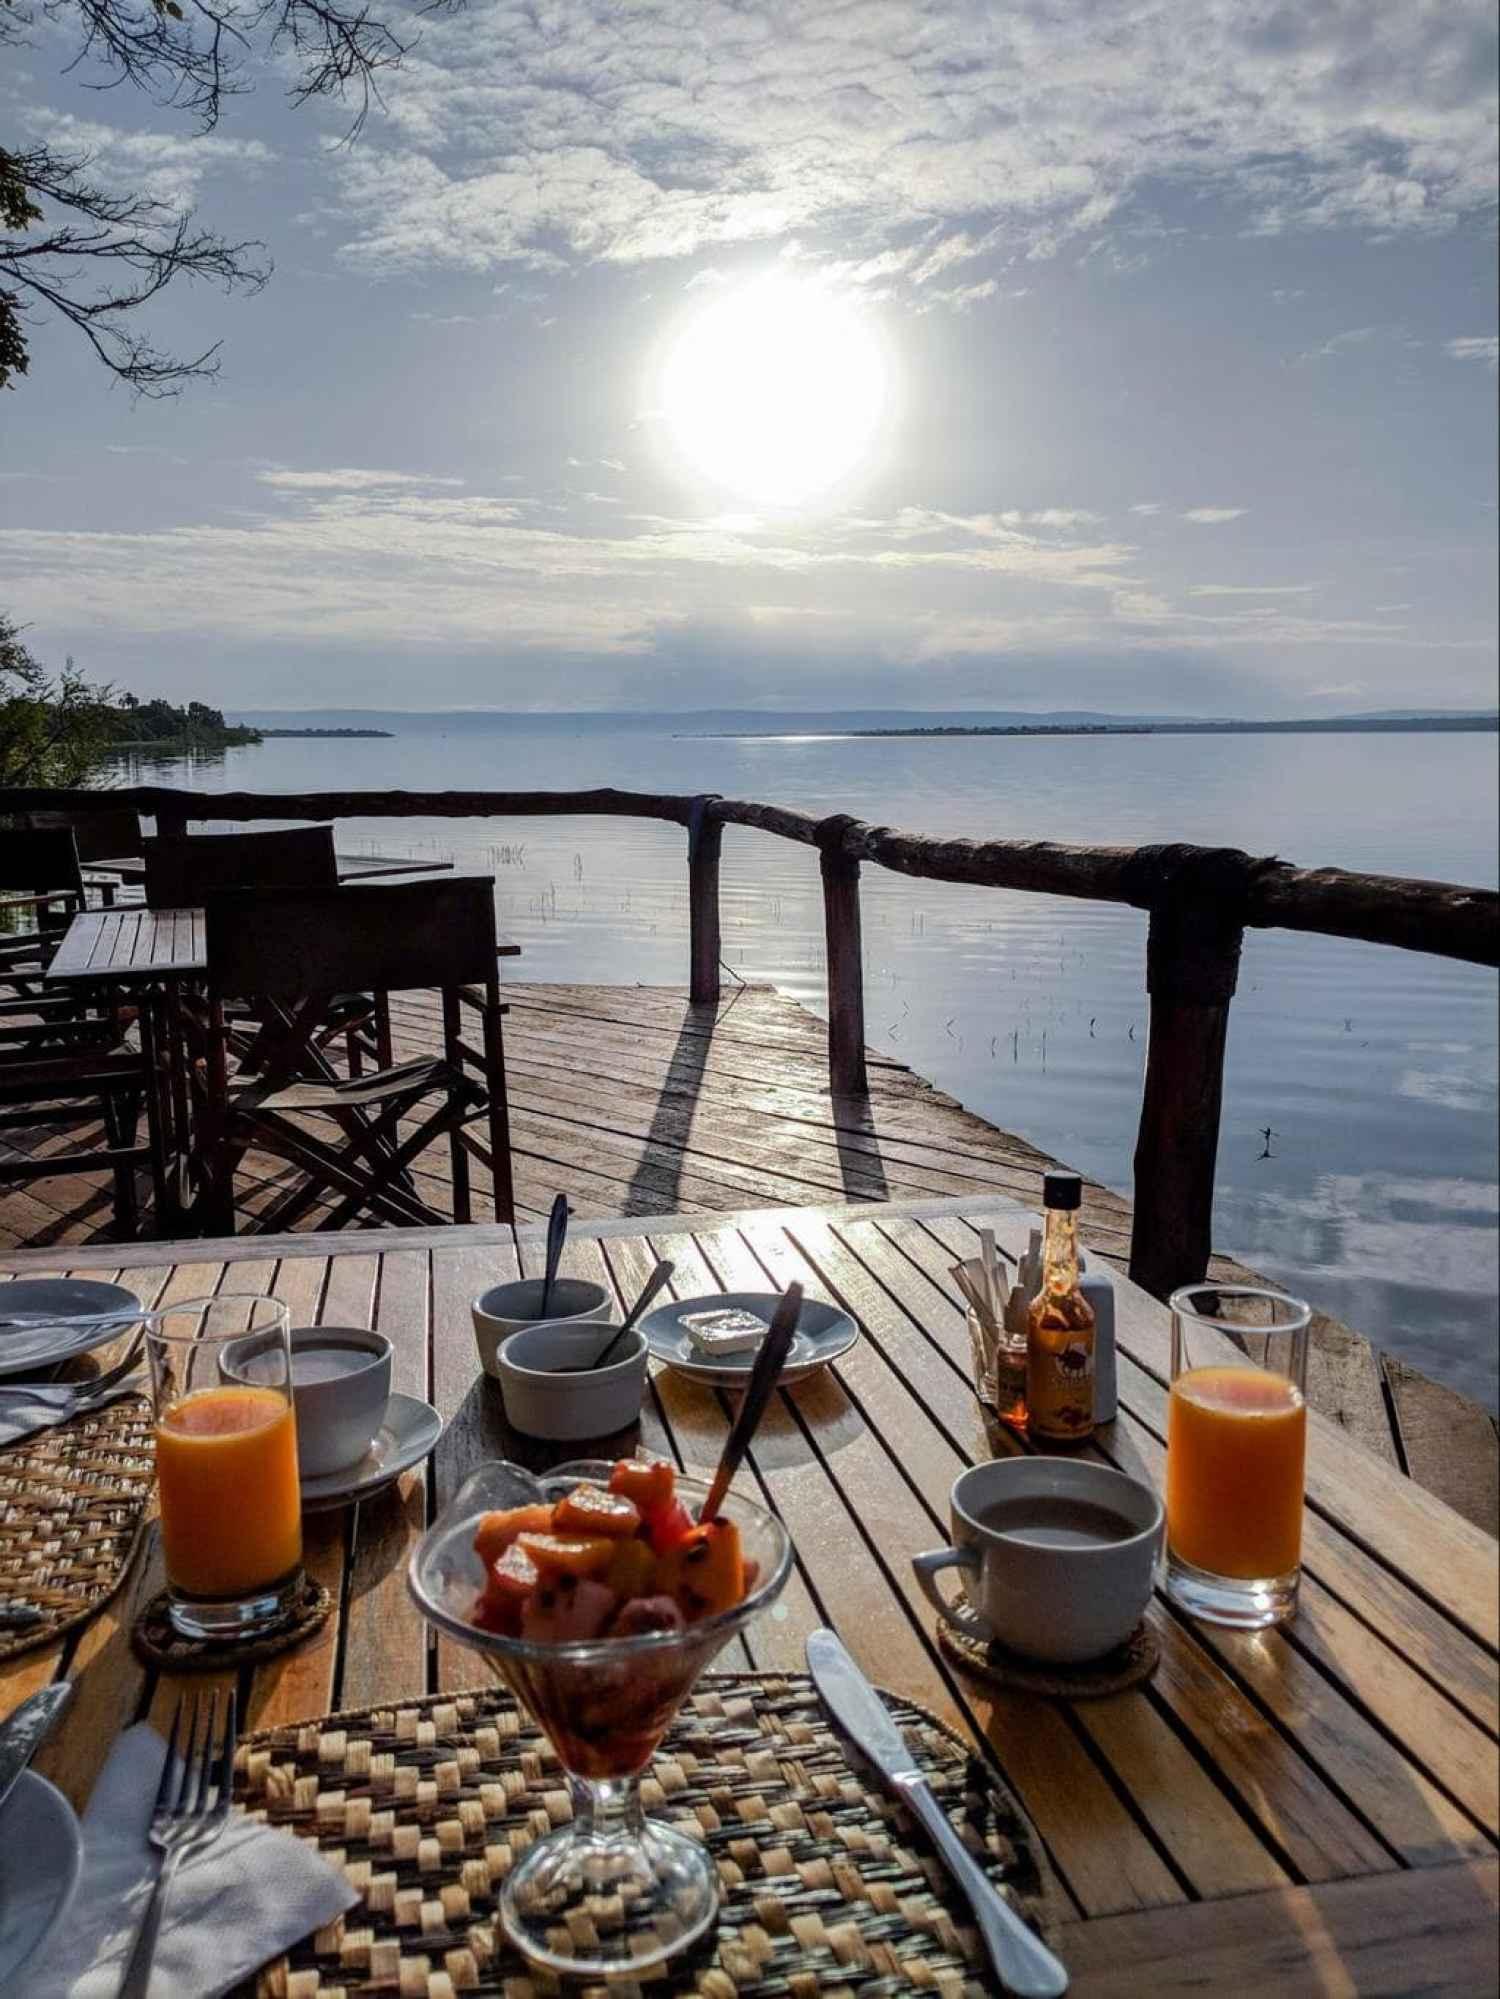 Breakfast in the viewing platform of Ruzizi